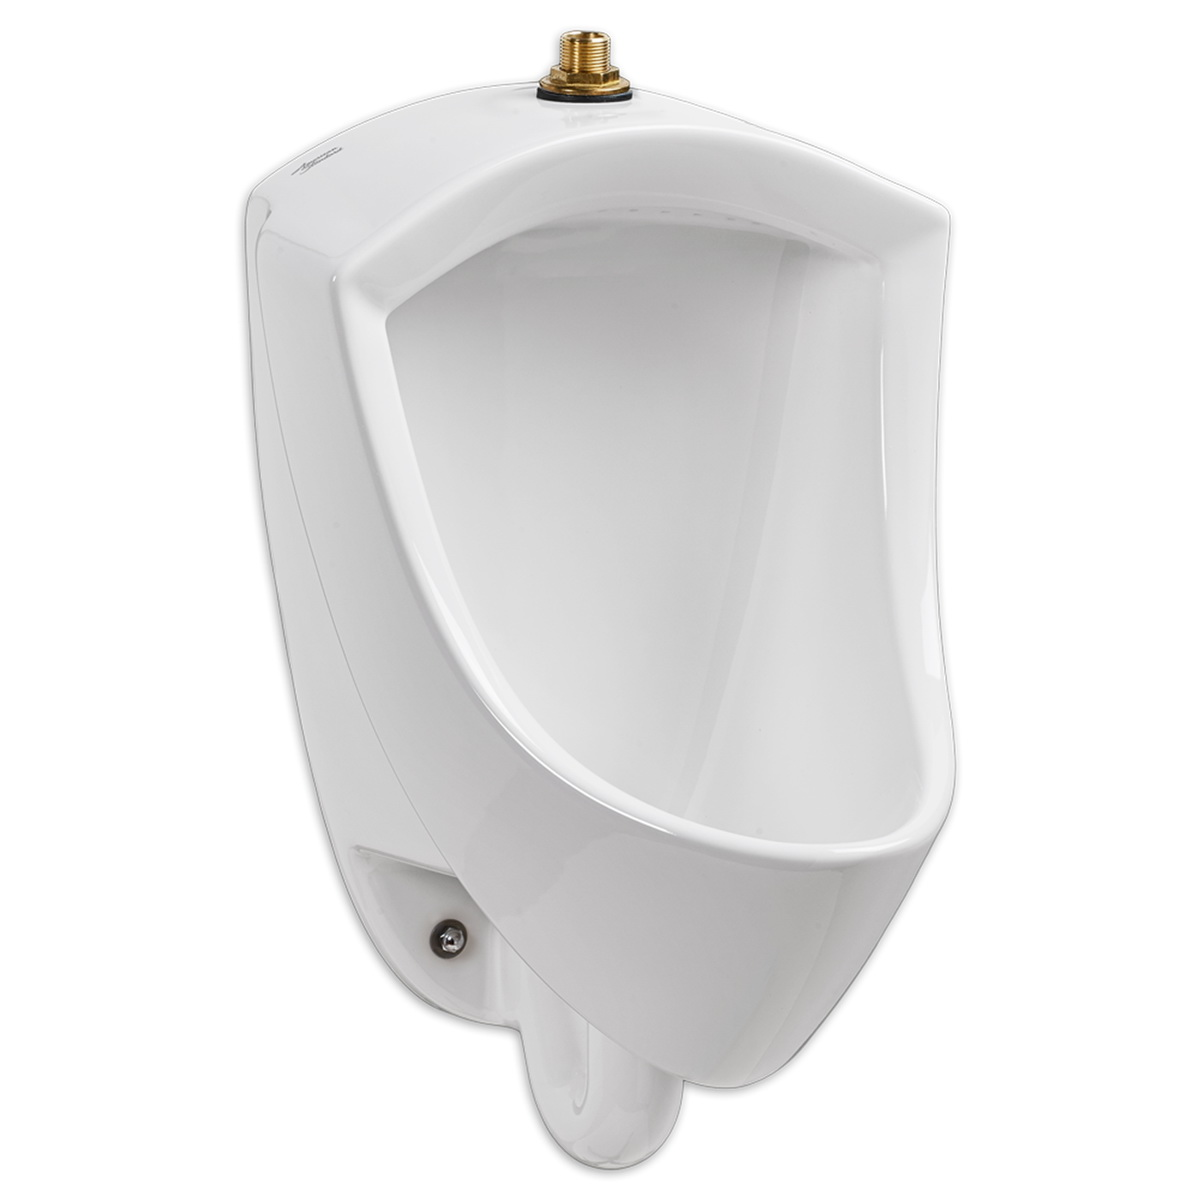 American Standard Pintbrook™ 6002.001.020 White Vitreous China Wall Mount High Efficiency Water Saving Urinal, IPS x NPT, 0.125 - 0.5 gpf